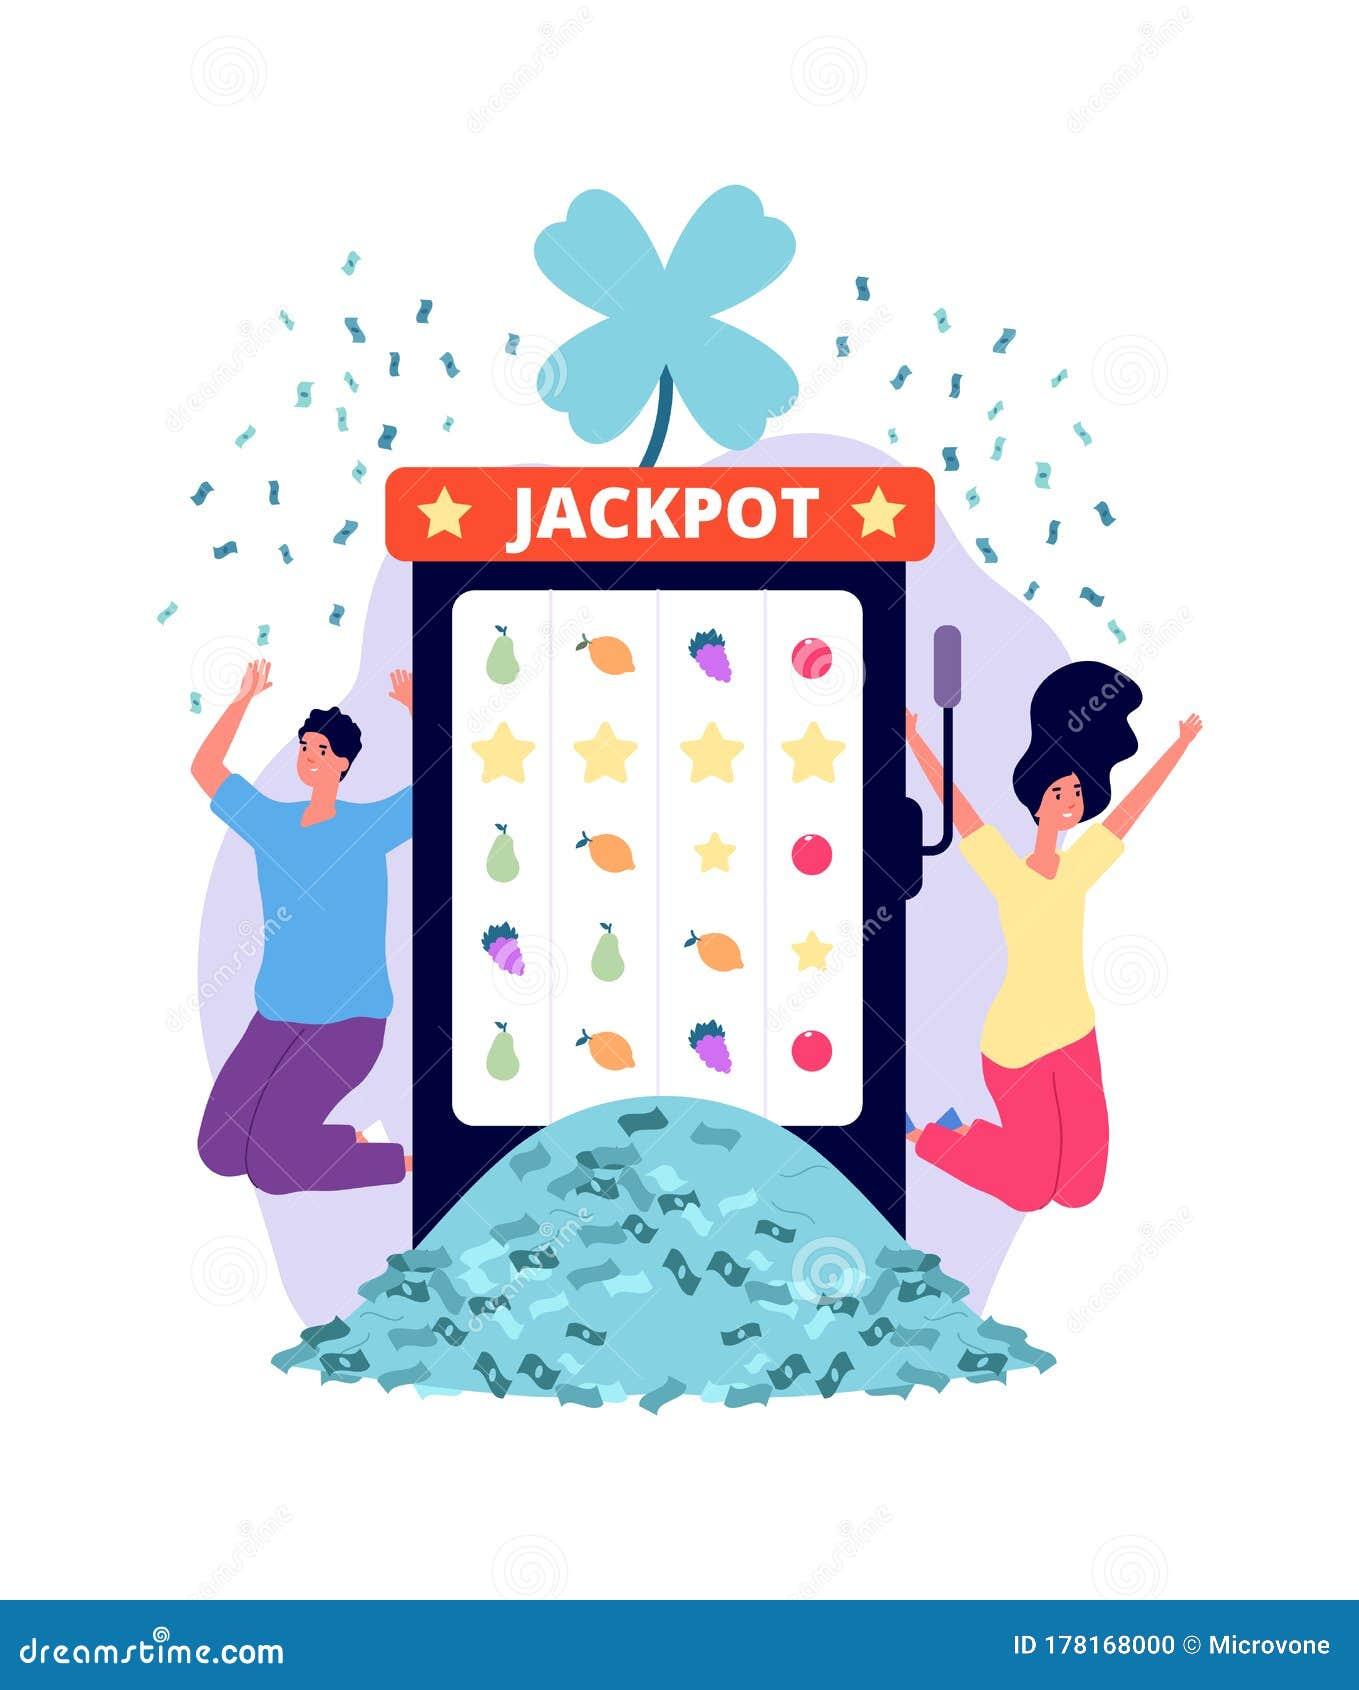 Lottery jackpot winners online betting betting chip